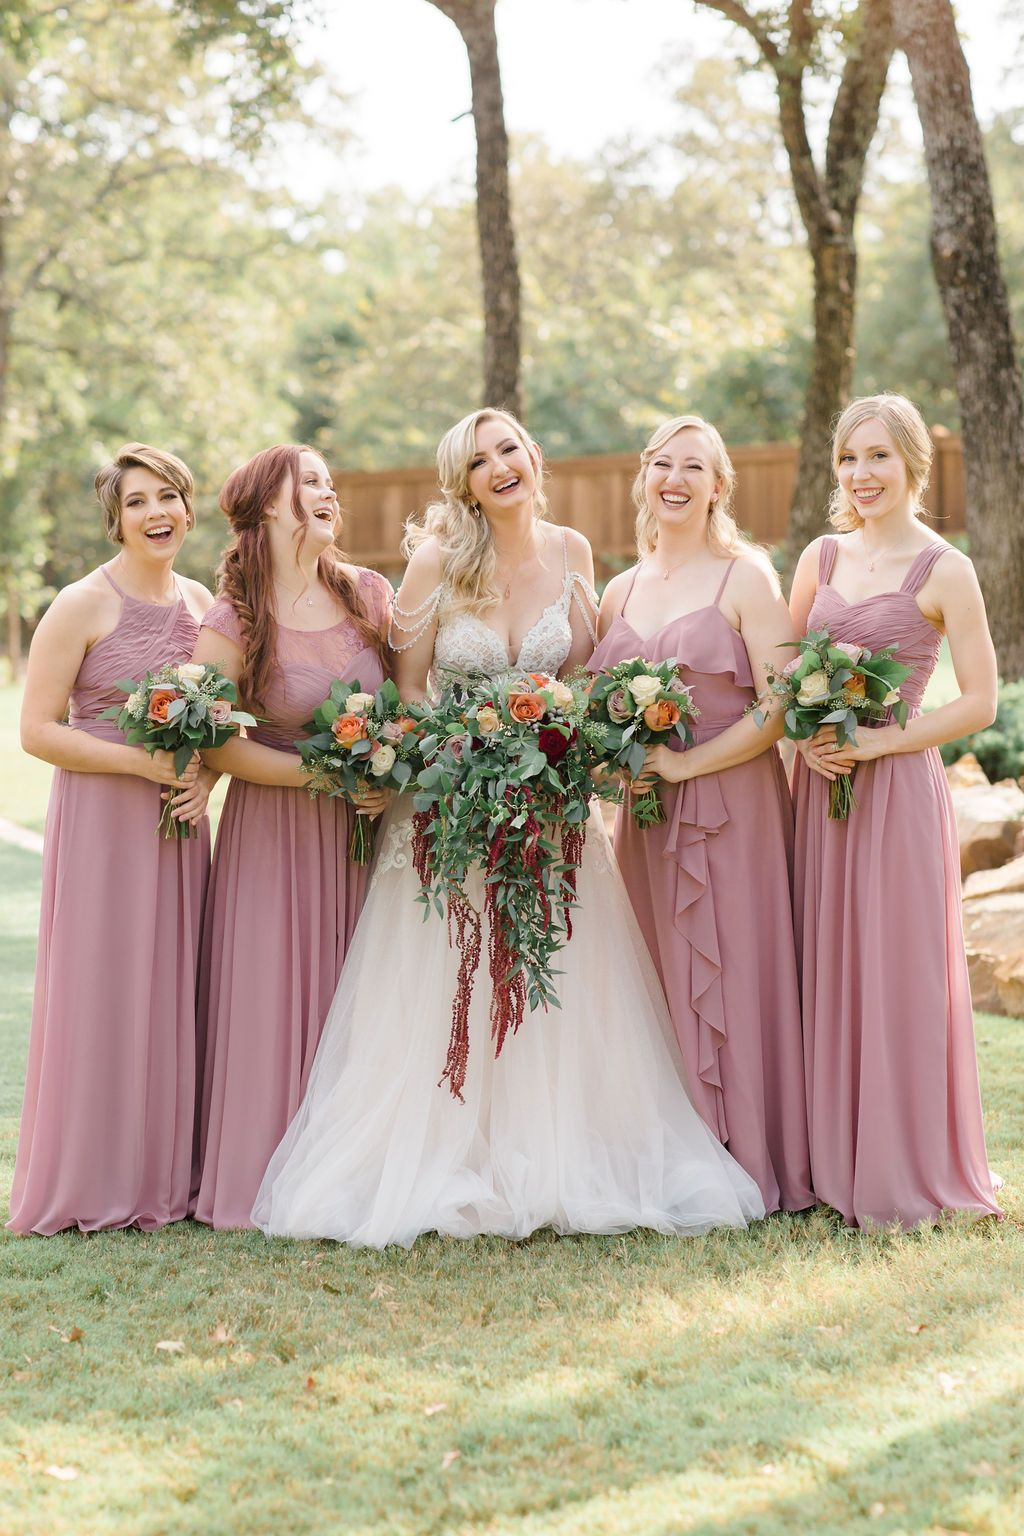 Bridesmaid Goals Dusty Rose Wedding Bridesmaid Matching Dresses Bridal Party Bri In 2020 Dallas Wedding Photographers Wedding Venues Blush Bridesmaid Dresses